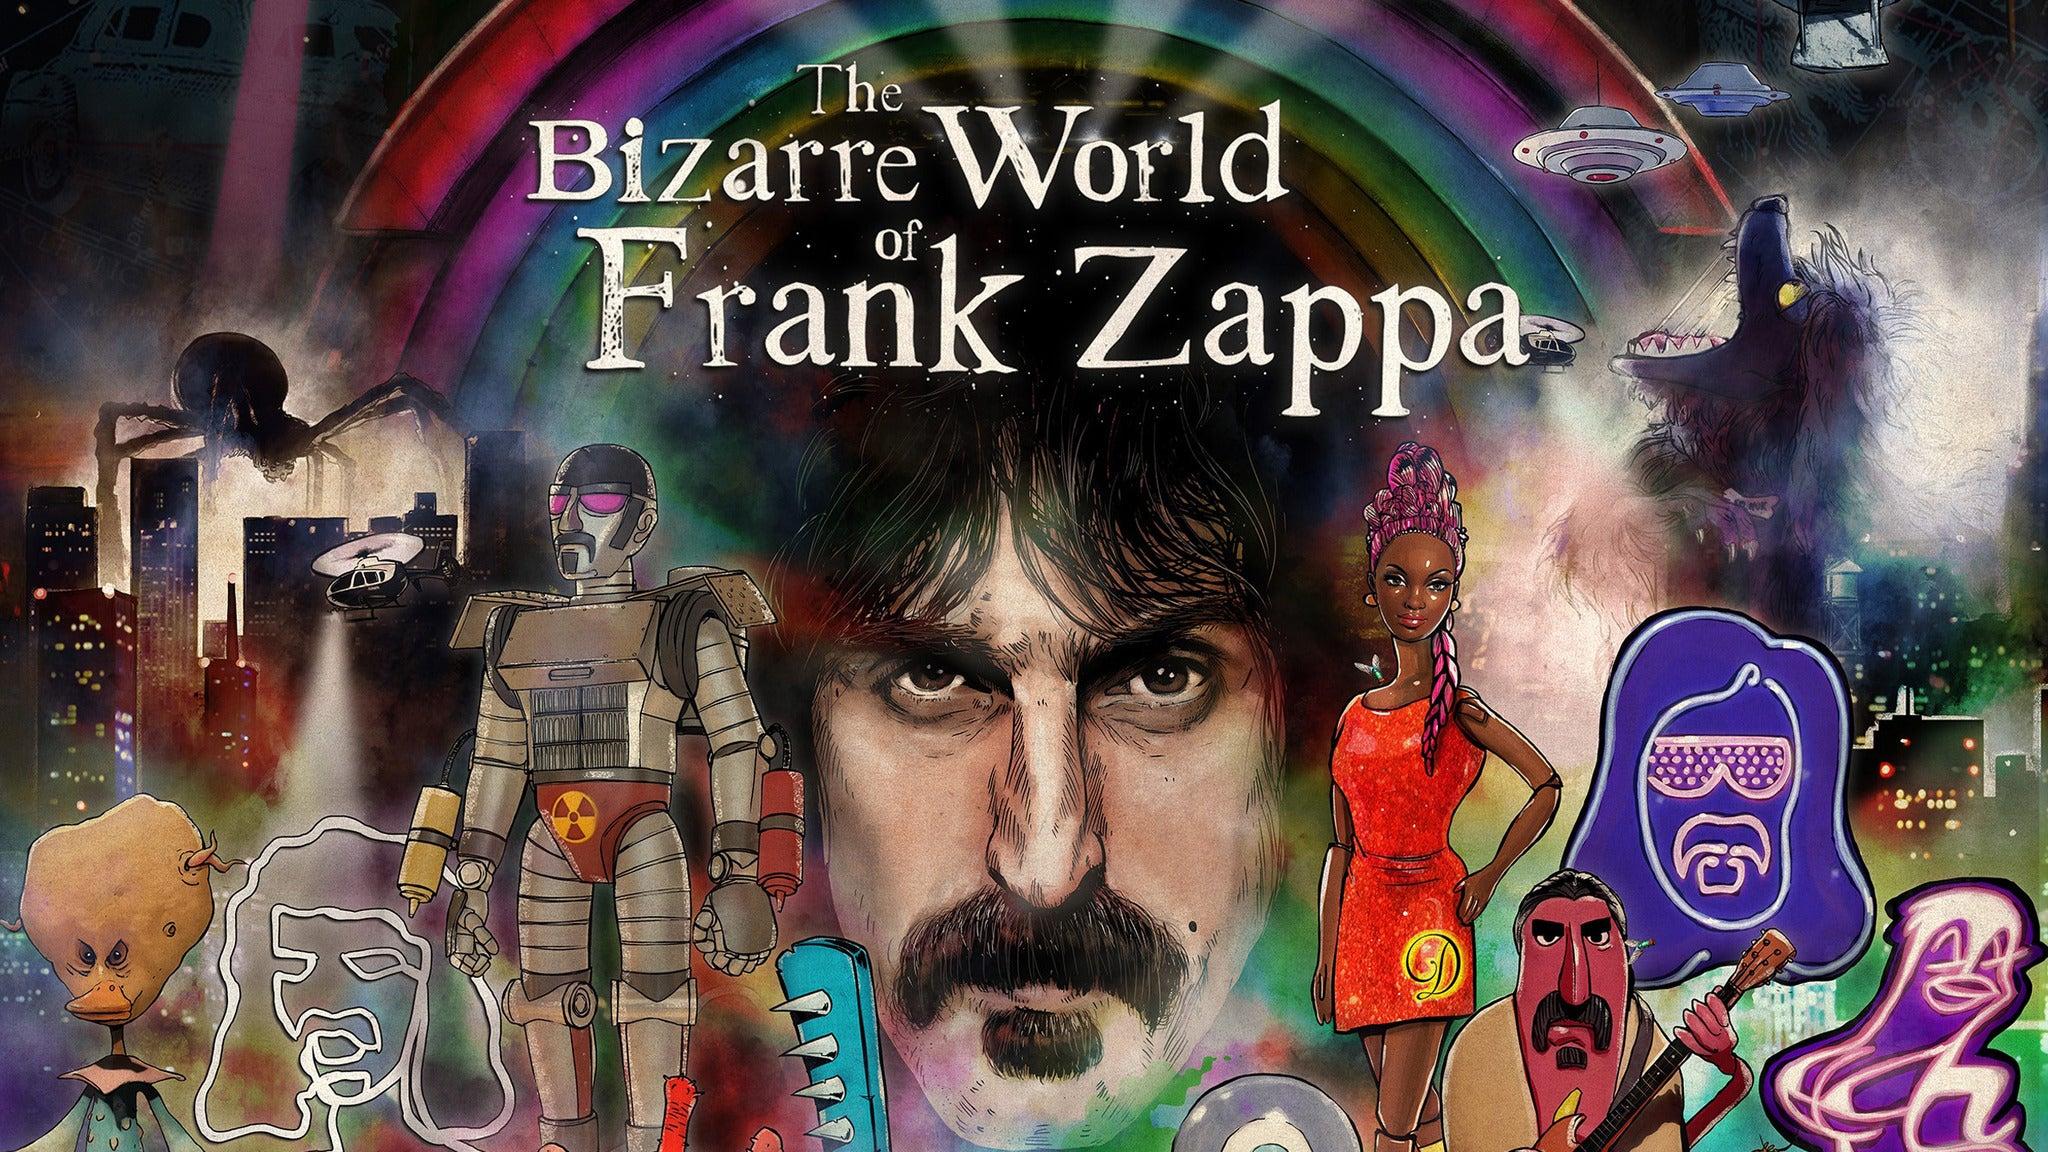 The Bizarre World of Frank Zappa at F.M. Kirby Center